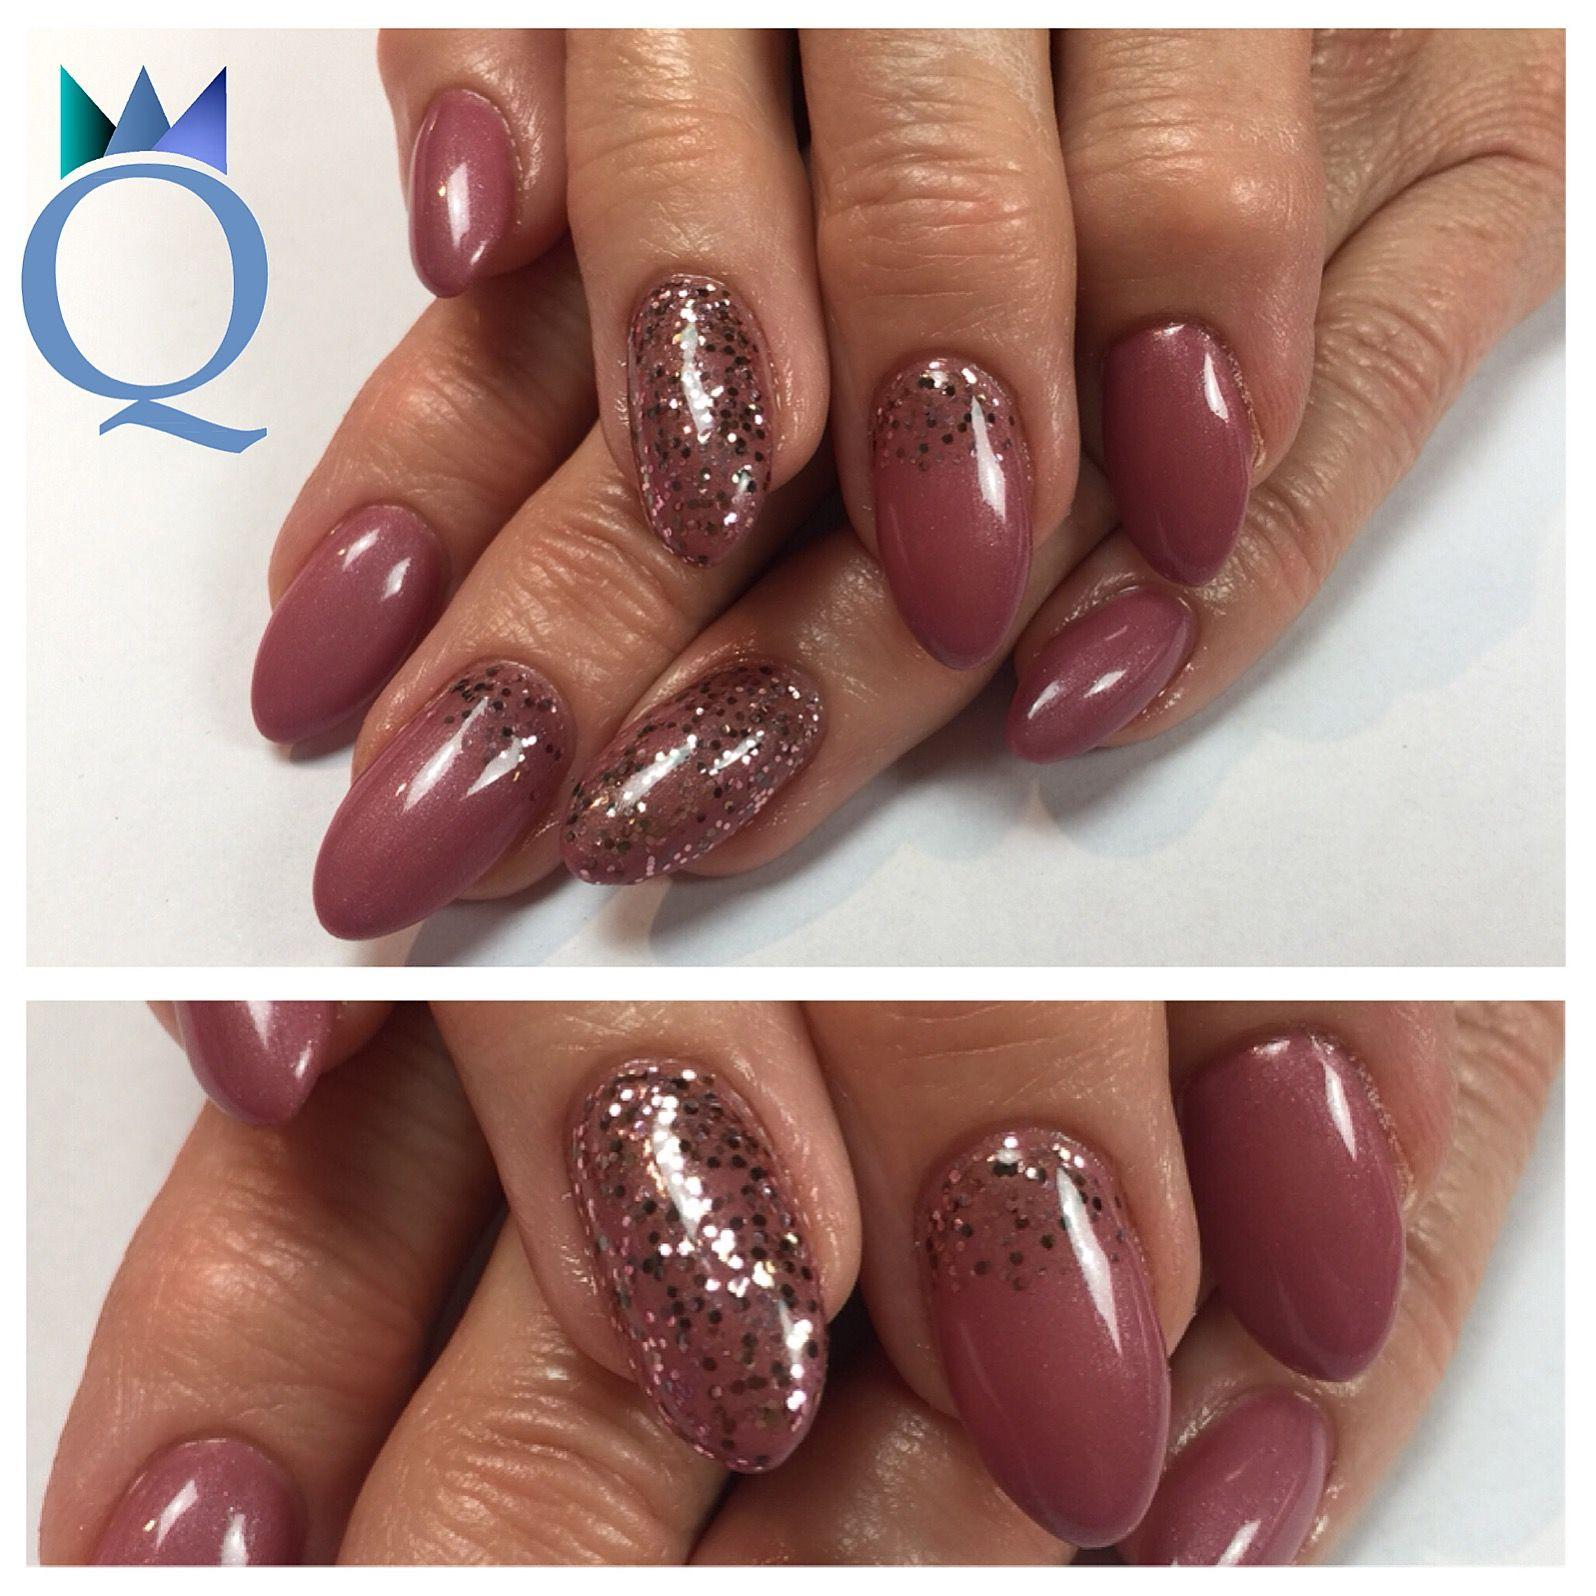 almondnails #gelnails #nails #plum #glitter #mandelform #gelnägel ...